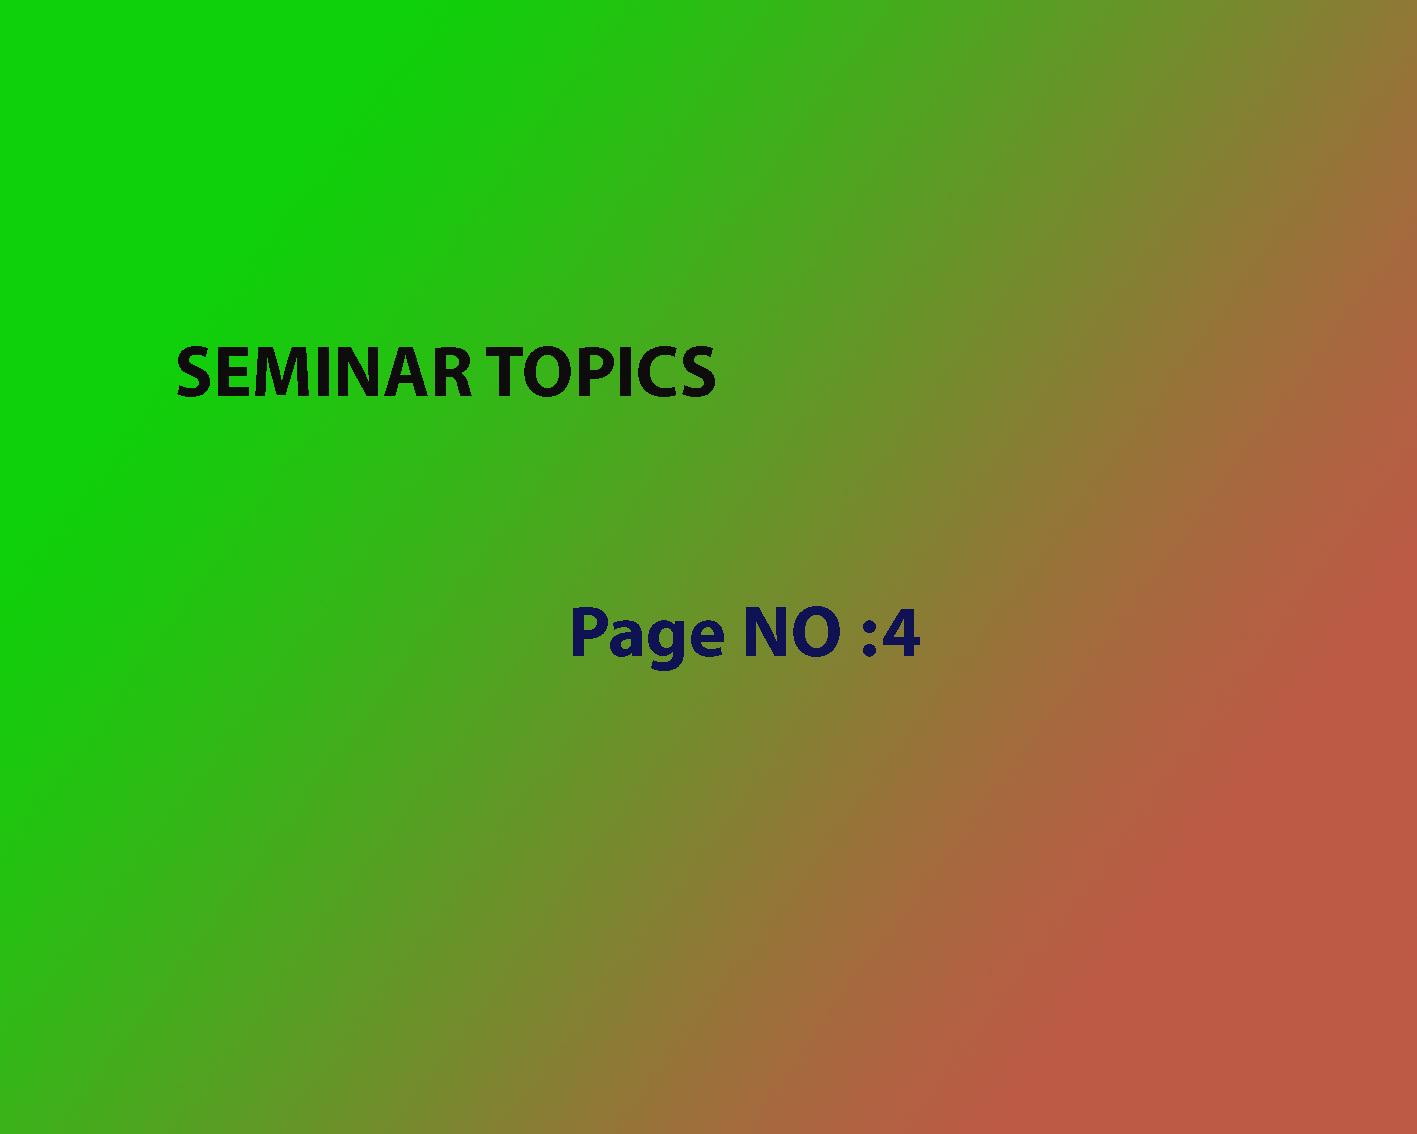 890 Seminar Topics for Civil Engineering-Page NO:4